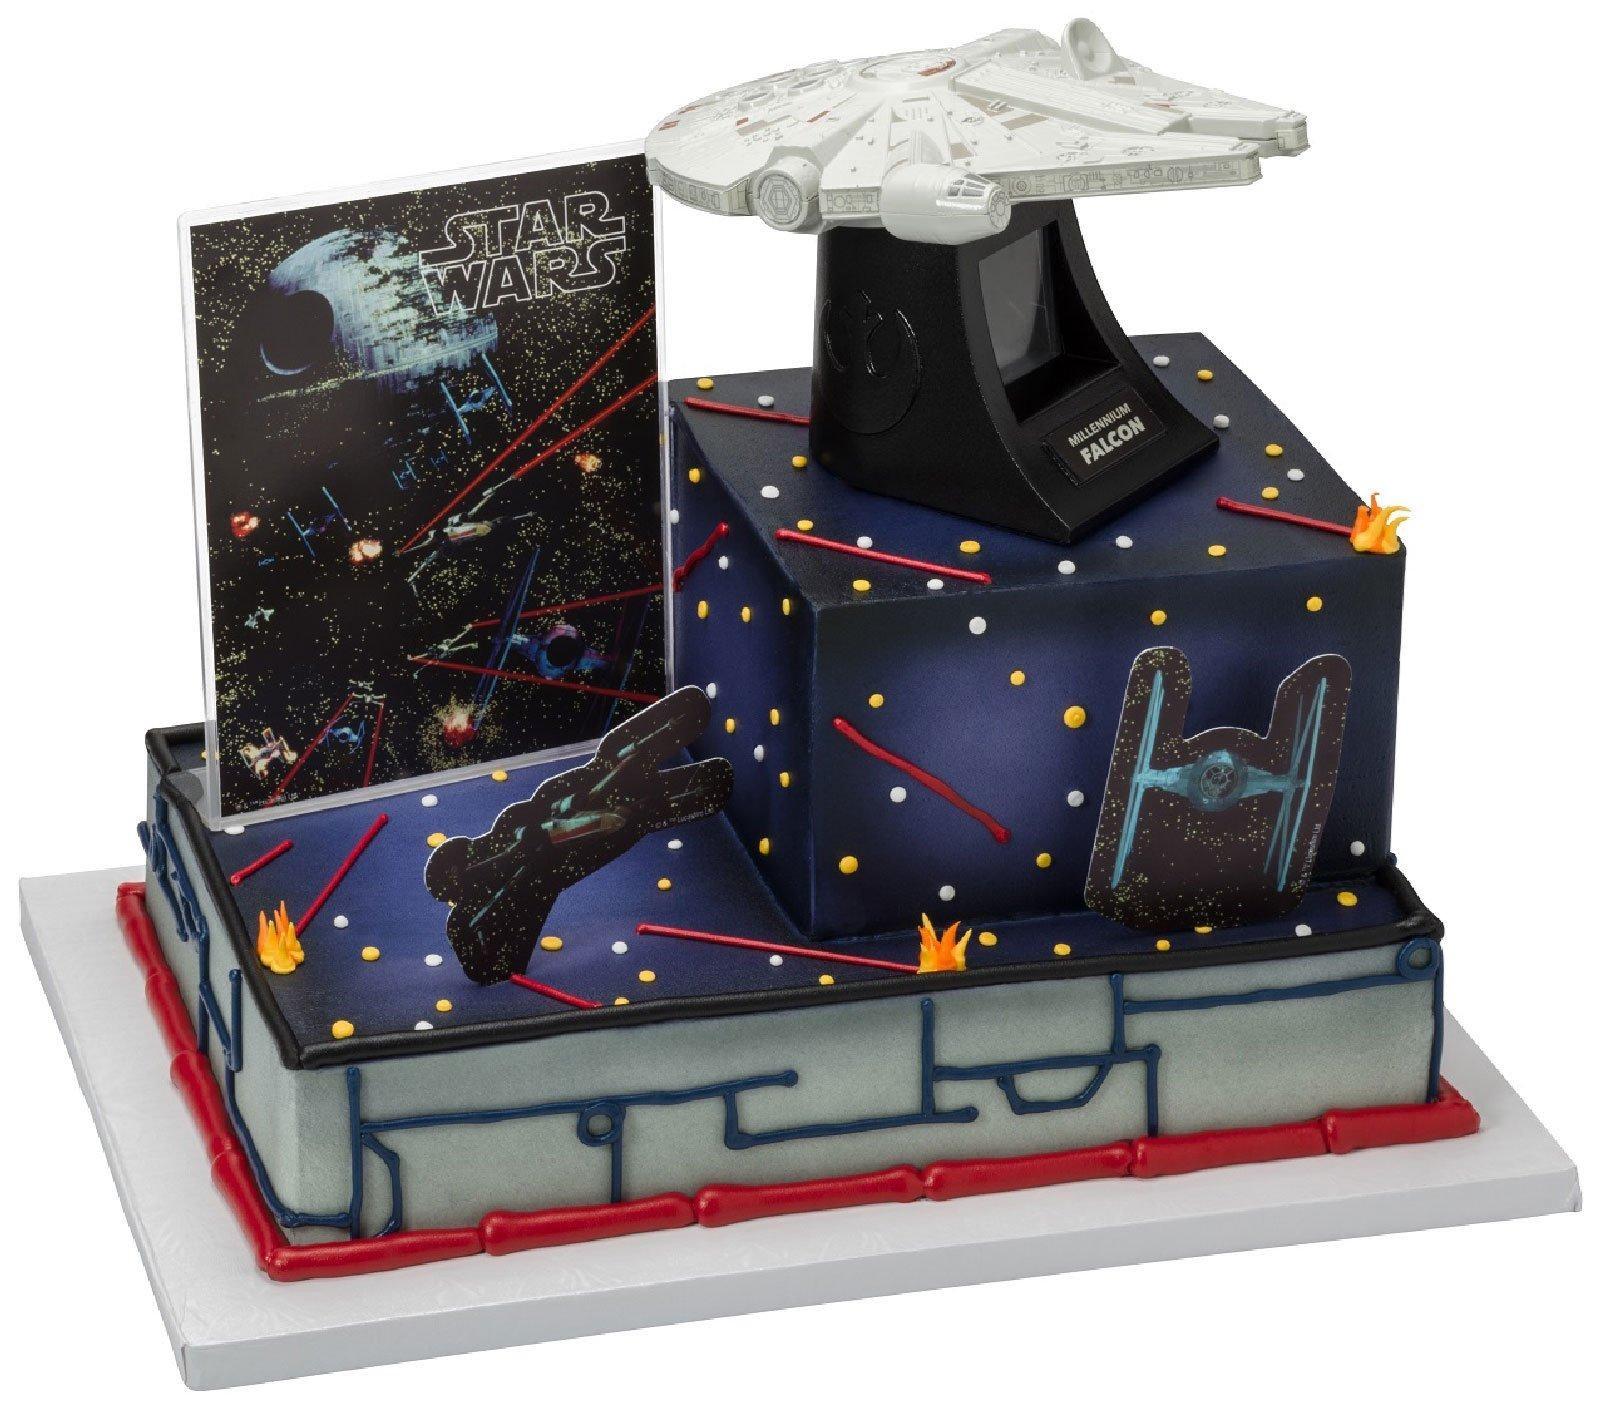 Star Wars Millennium Falcon Cake Topper 4 Pieces